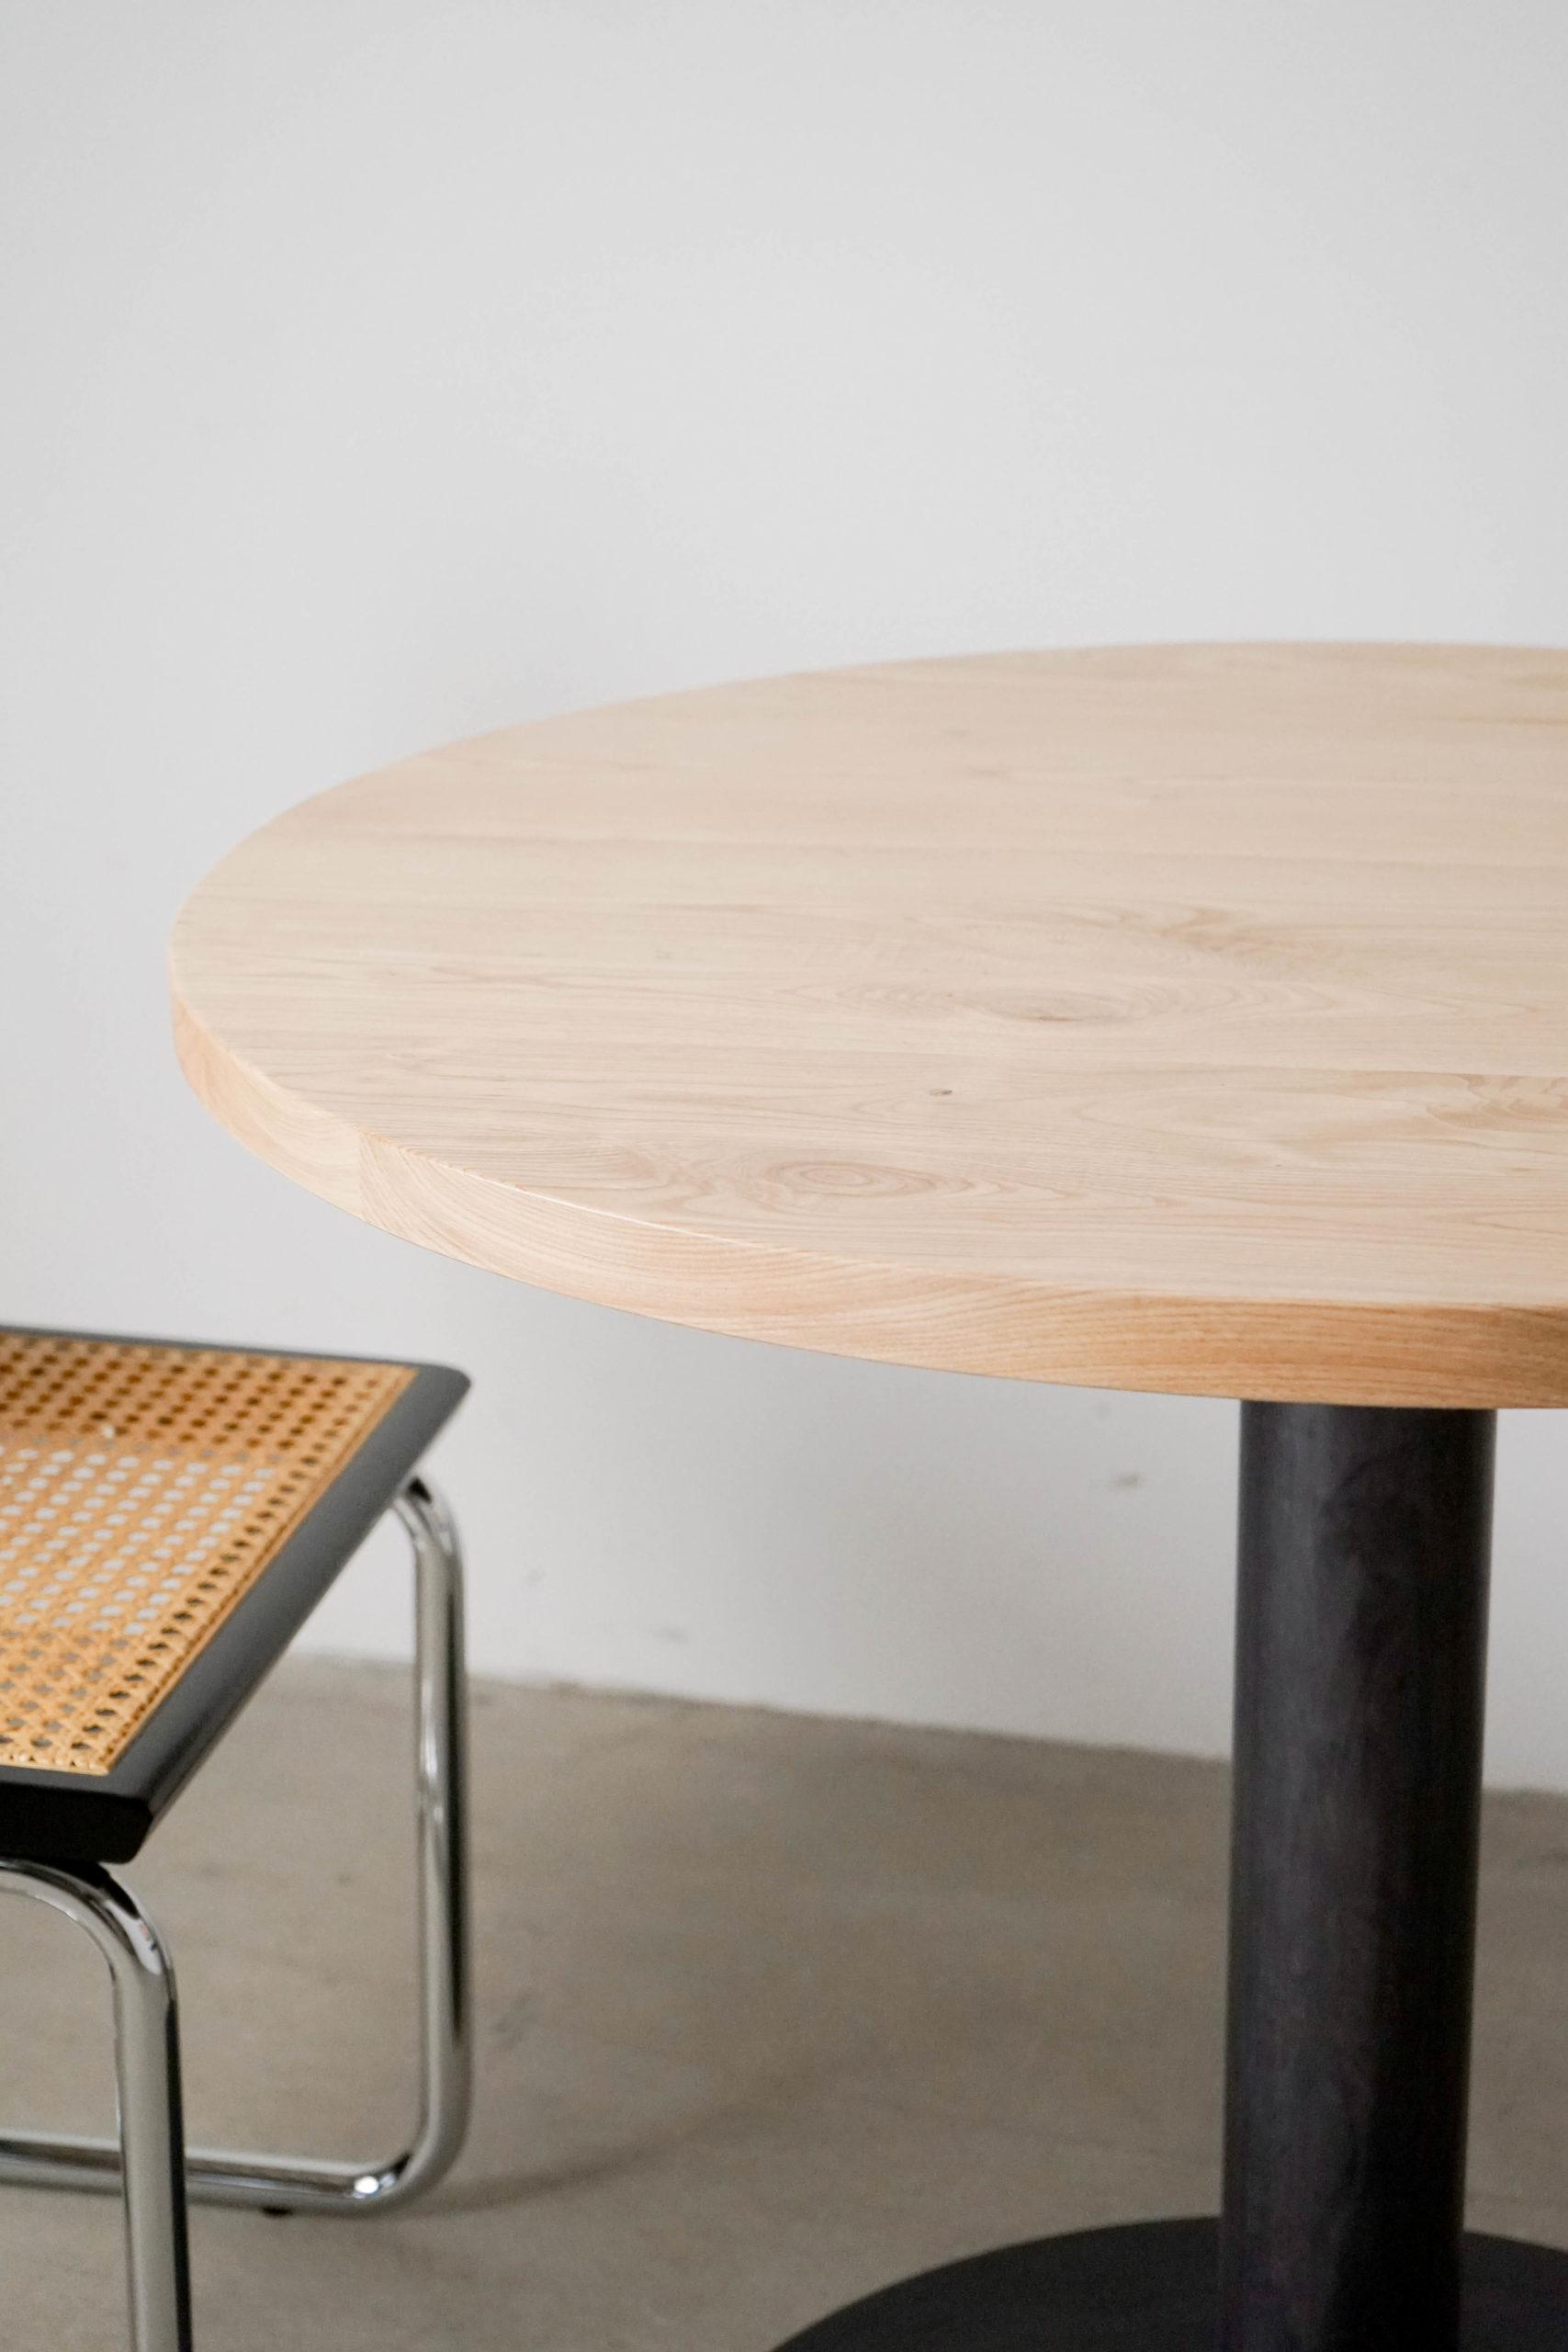 mesa de madera redonda hecha a mano de diseño metal madera elegante